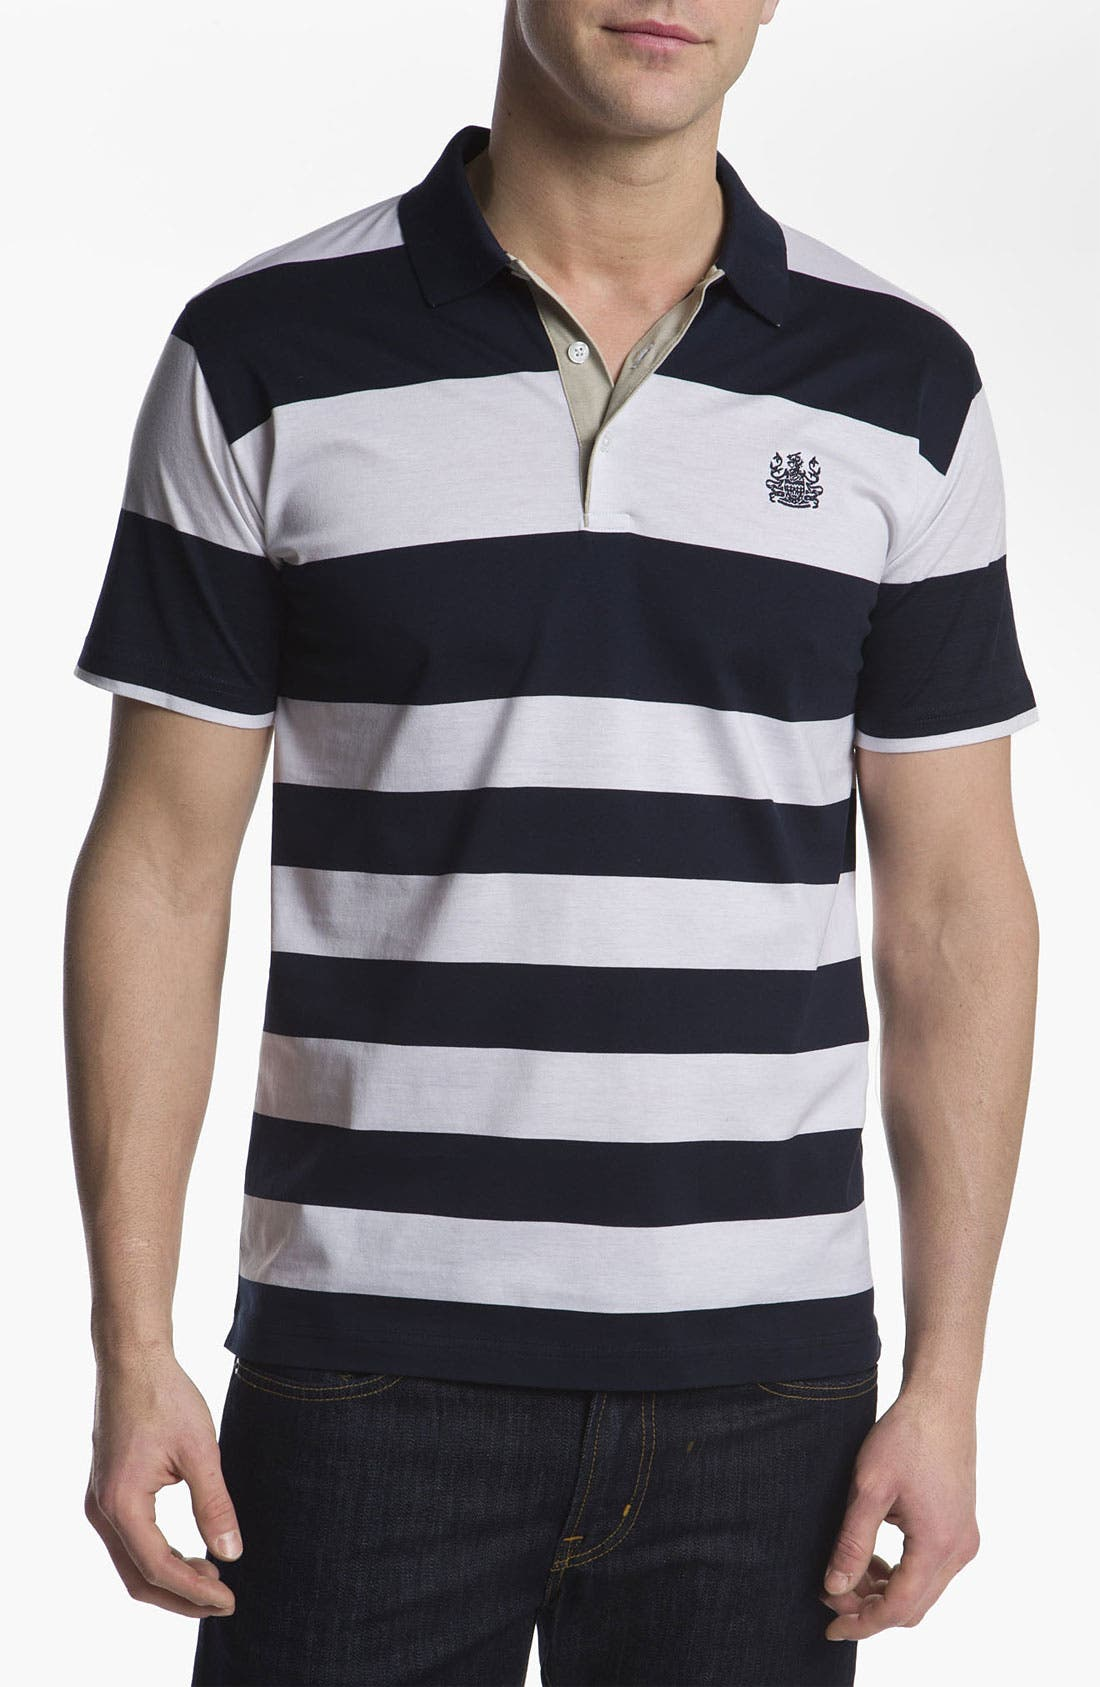 Main Image - Aquascutum Golf 'Block Stripe' Golf Polo